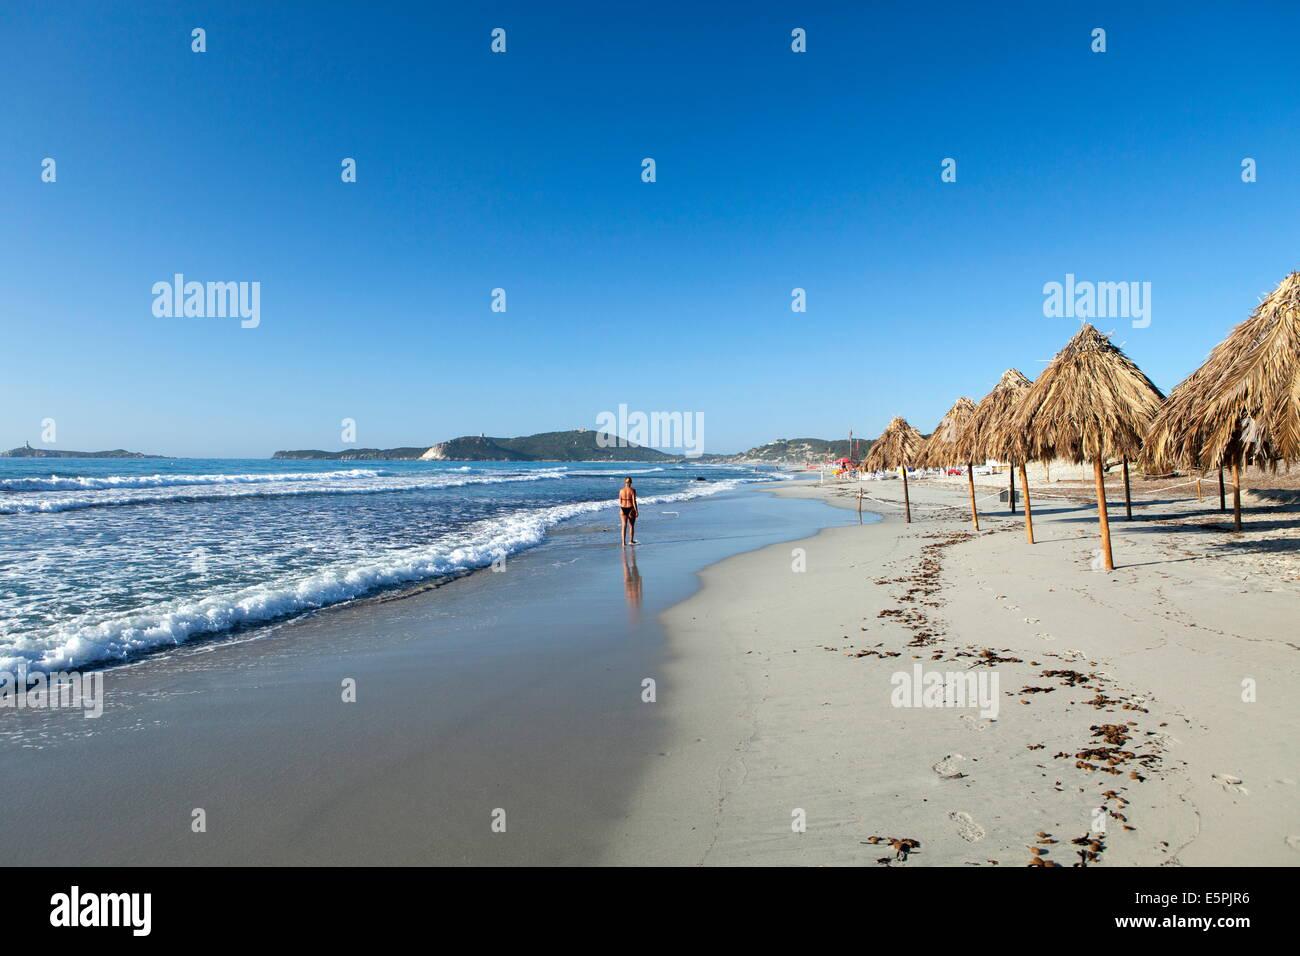 Playa de Villasimius, provincia de Cagliari, Cerdeña, Italia, Mediterráneo, Europa Foto de stock